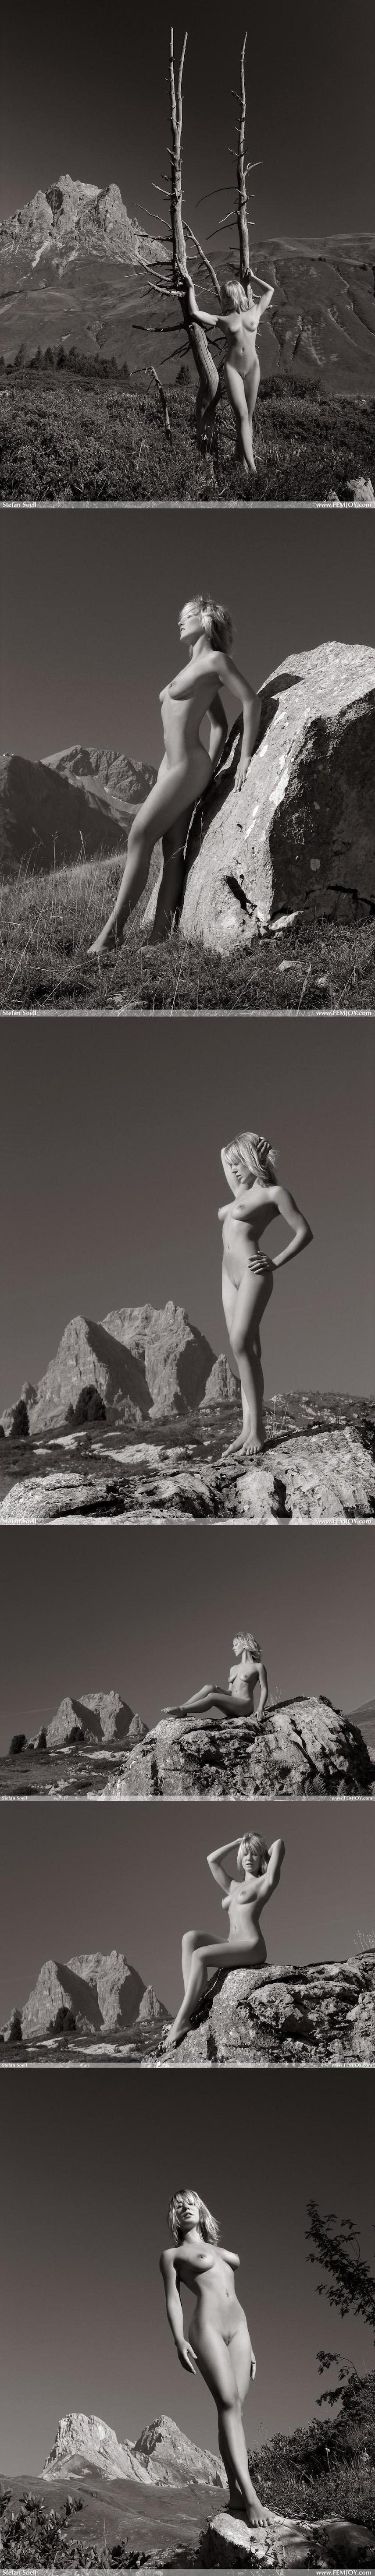 FEdf  - 2005-03-03 - Julia S - Alps x16 2000px